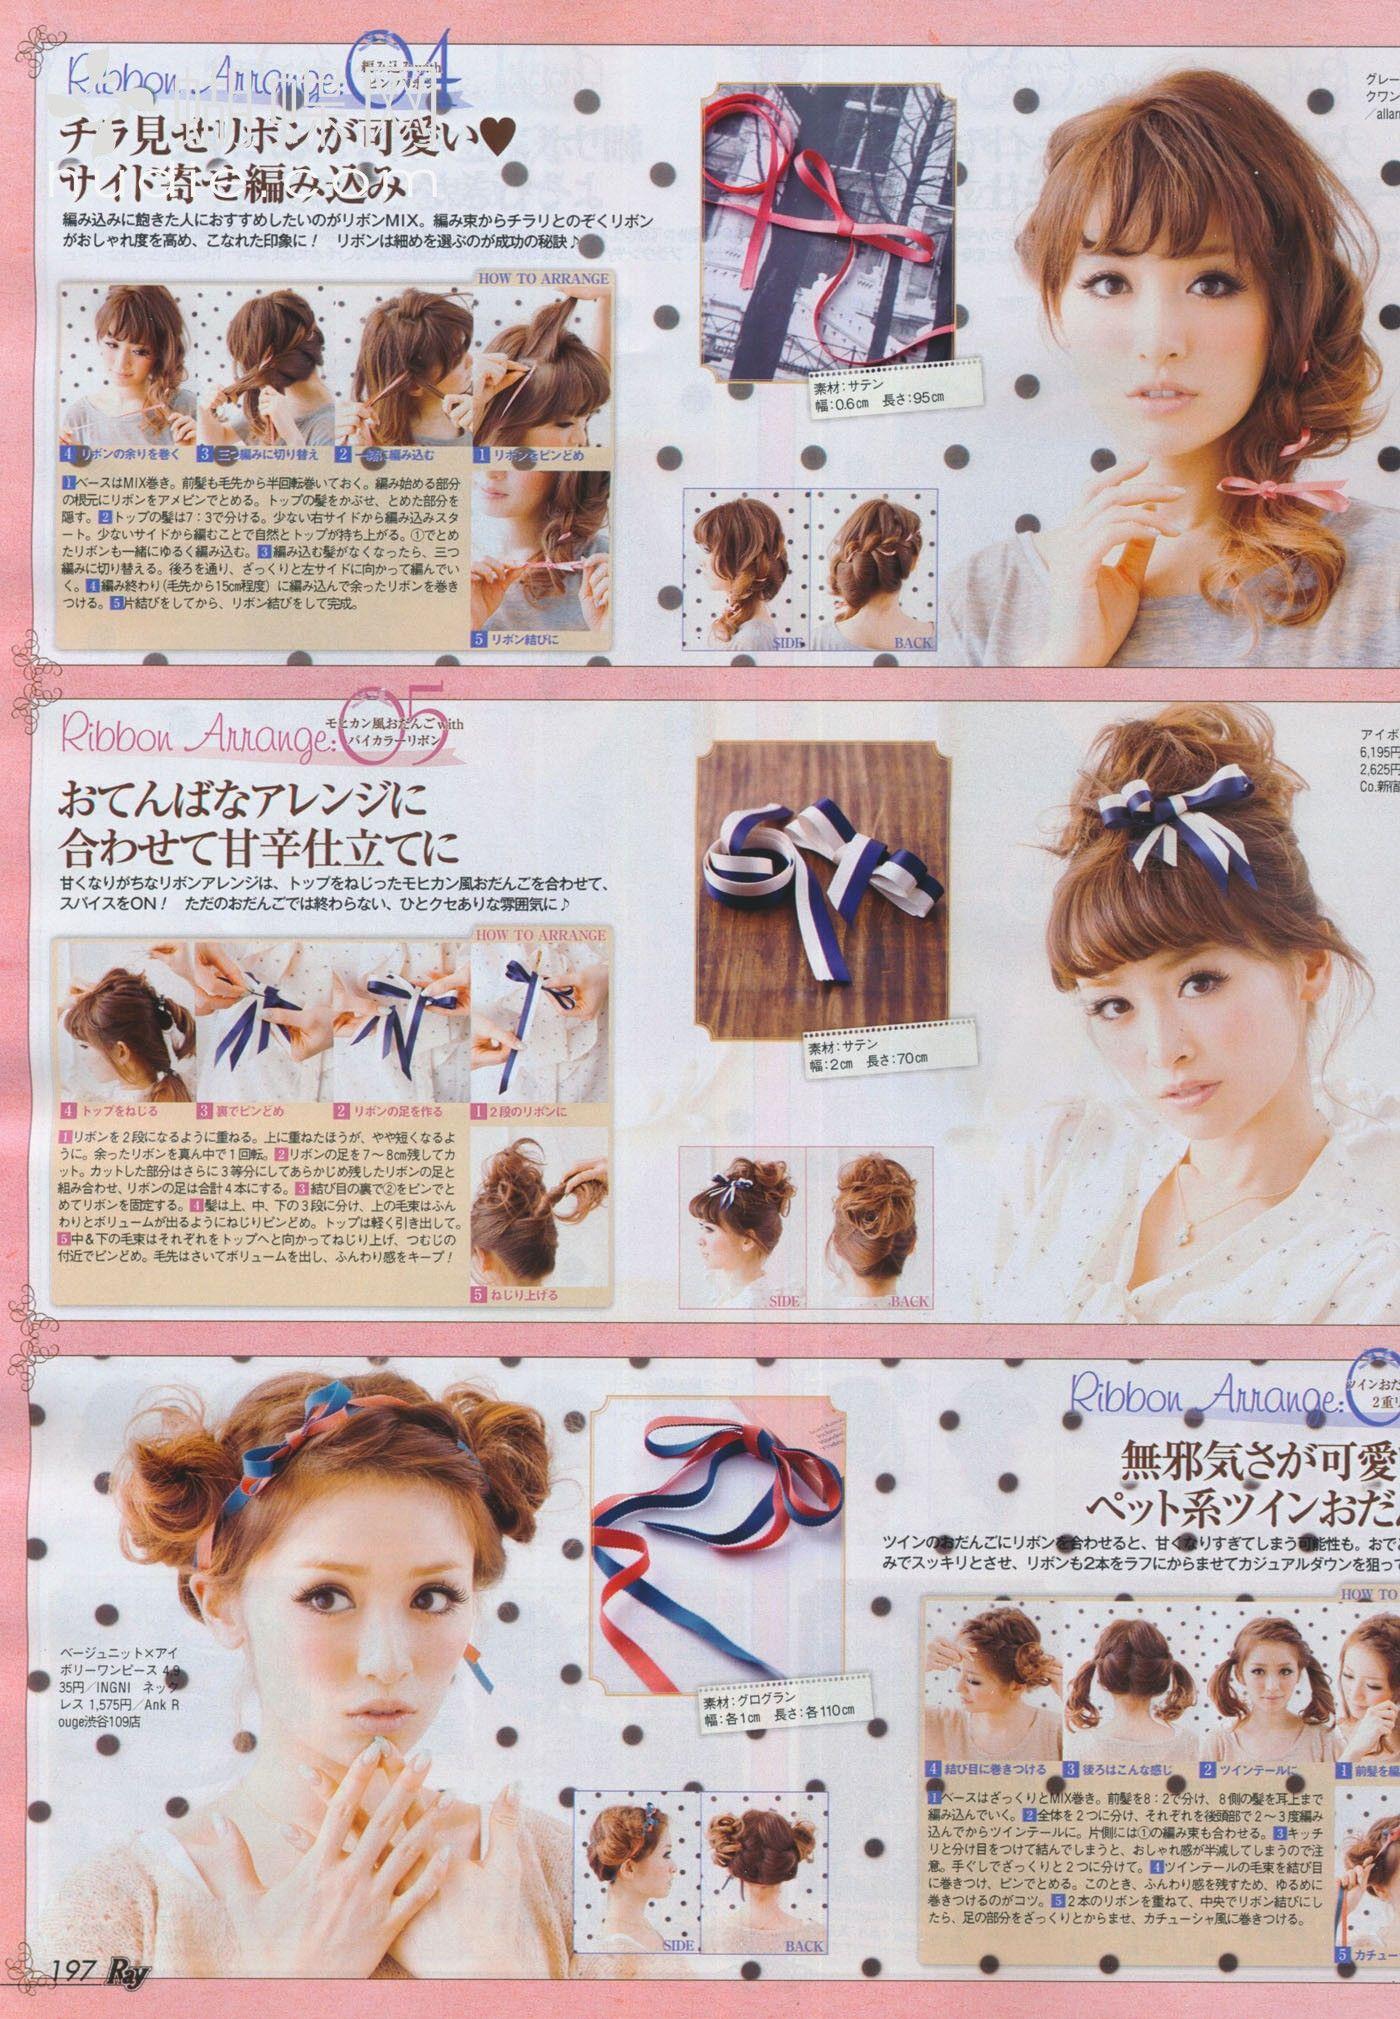 Hairstyles Using A Ribbon Kawaii Hairstyles Japanese Hairstyle Casual Updo